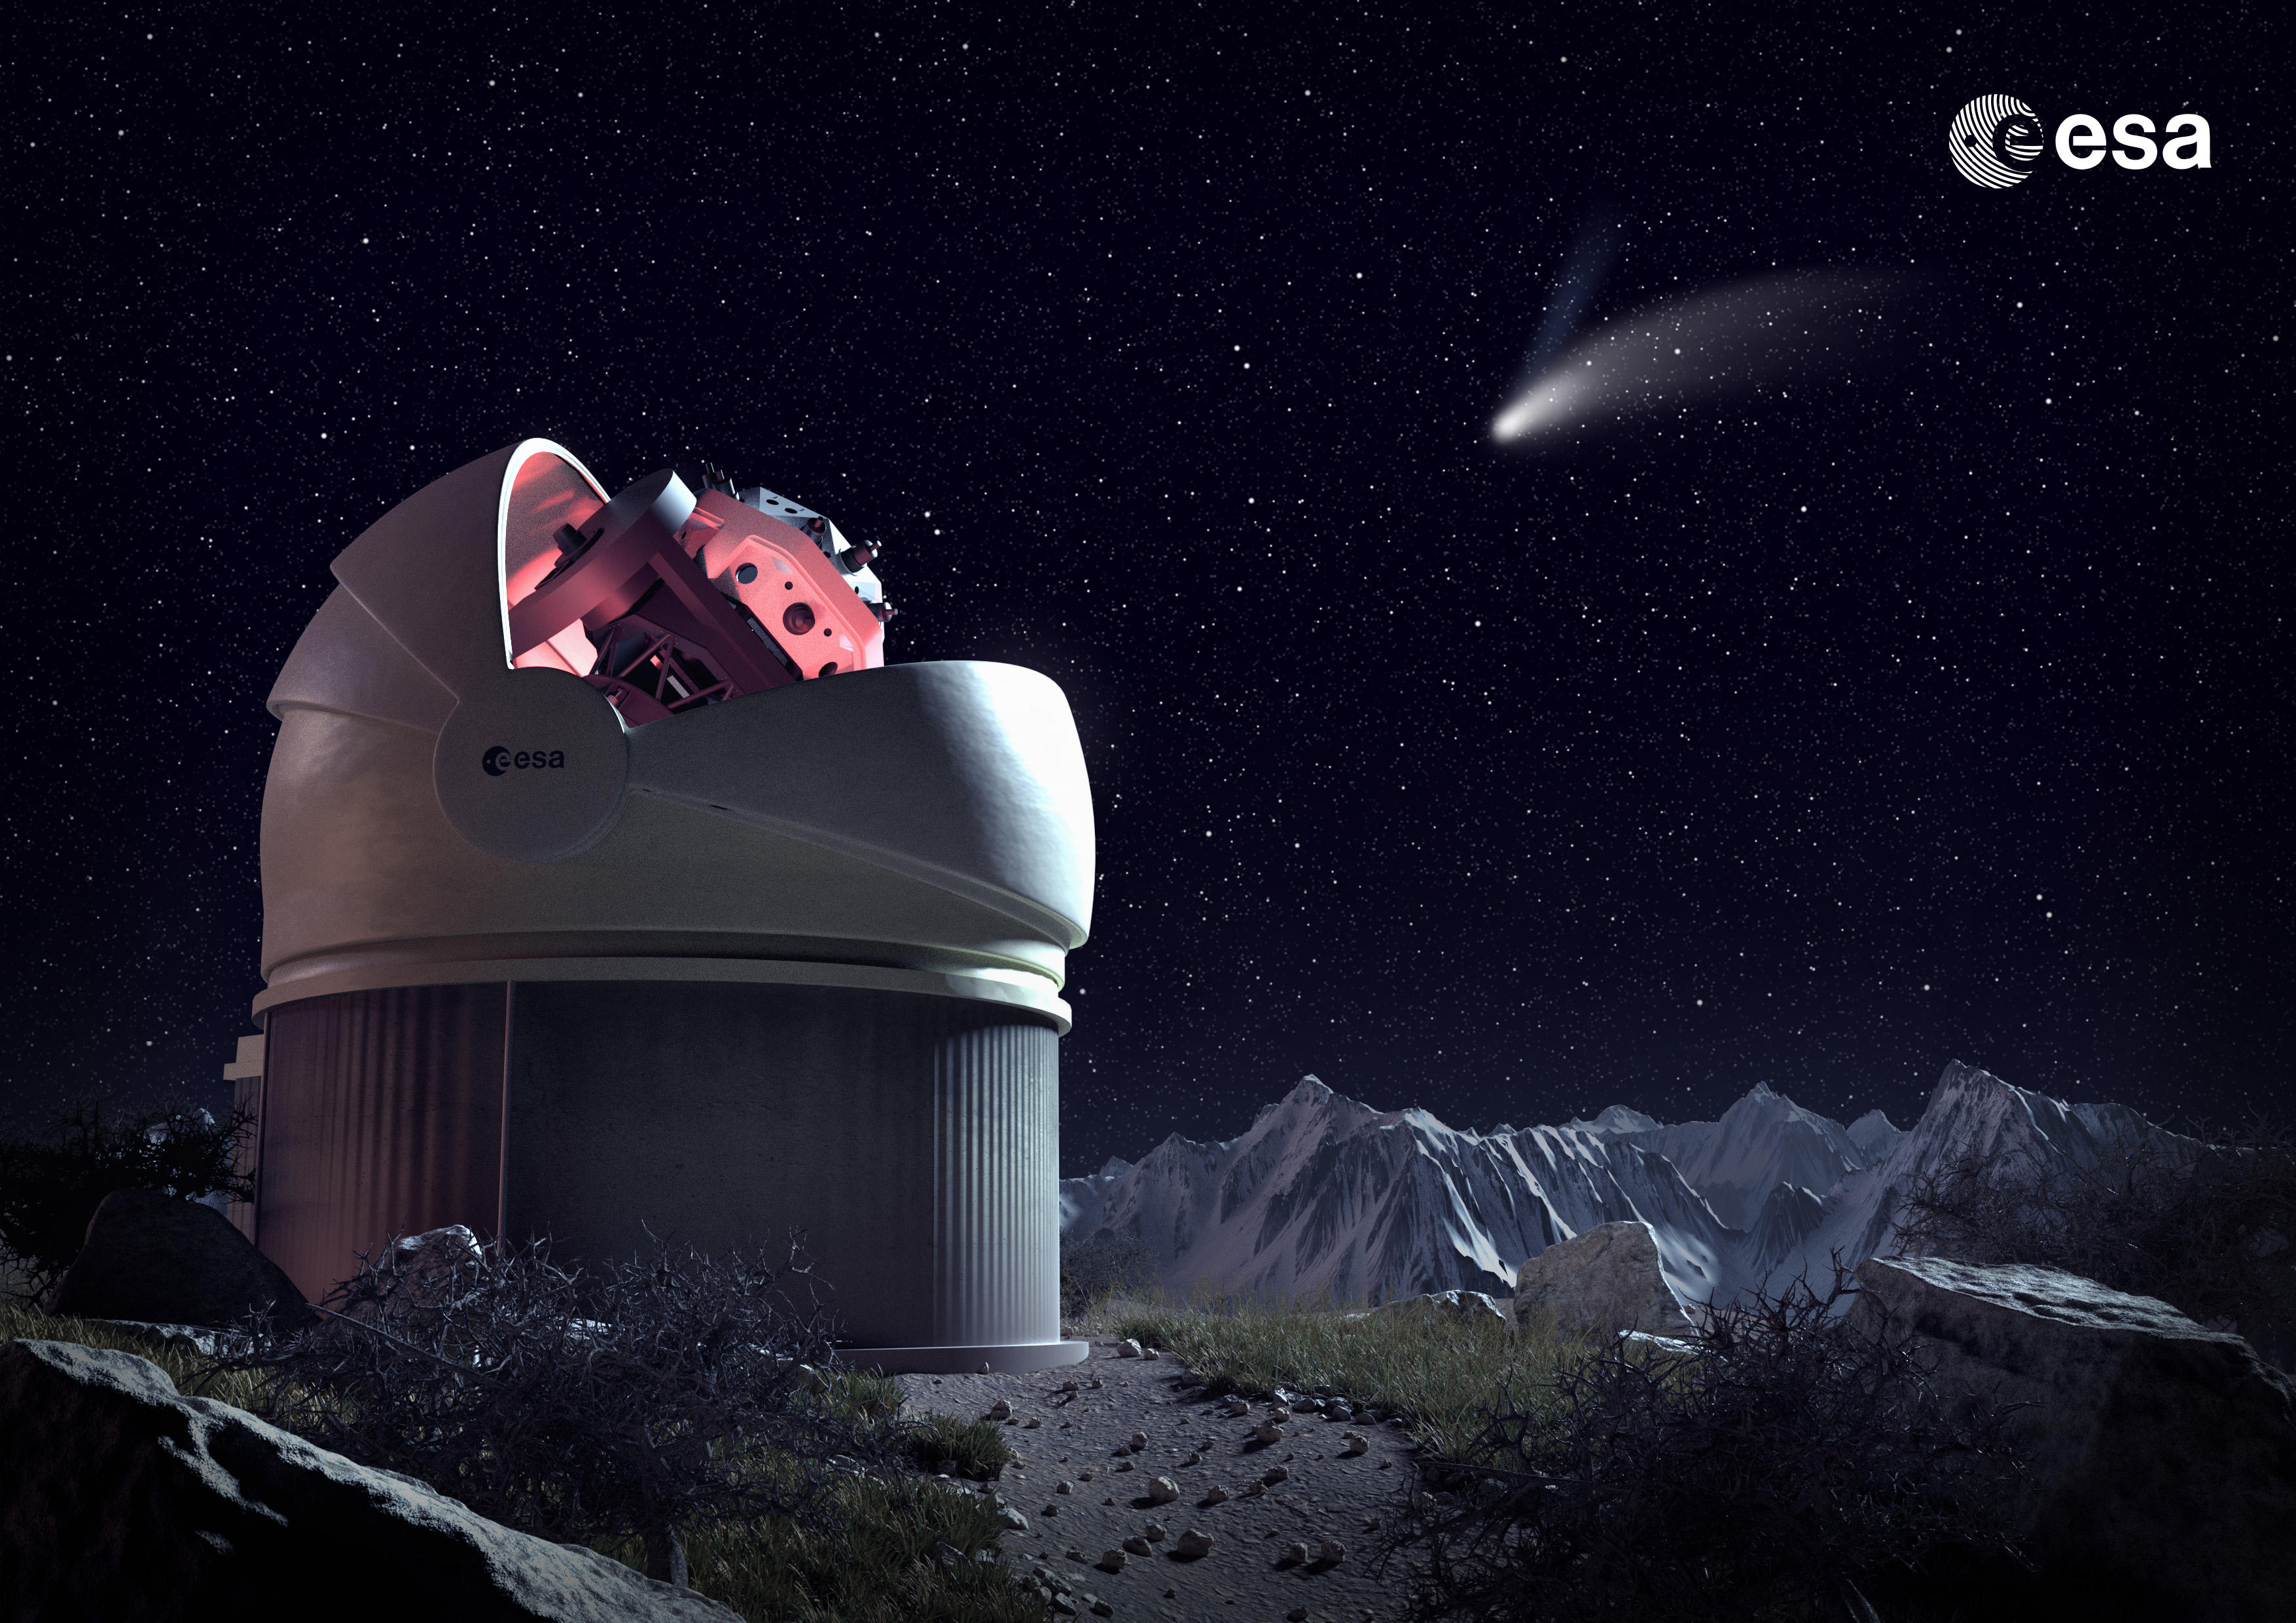 обсерватория, телескоп, наука, техника, космос, ночь, звёзды, комета, графика